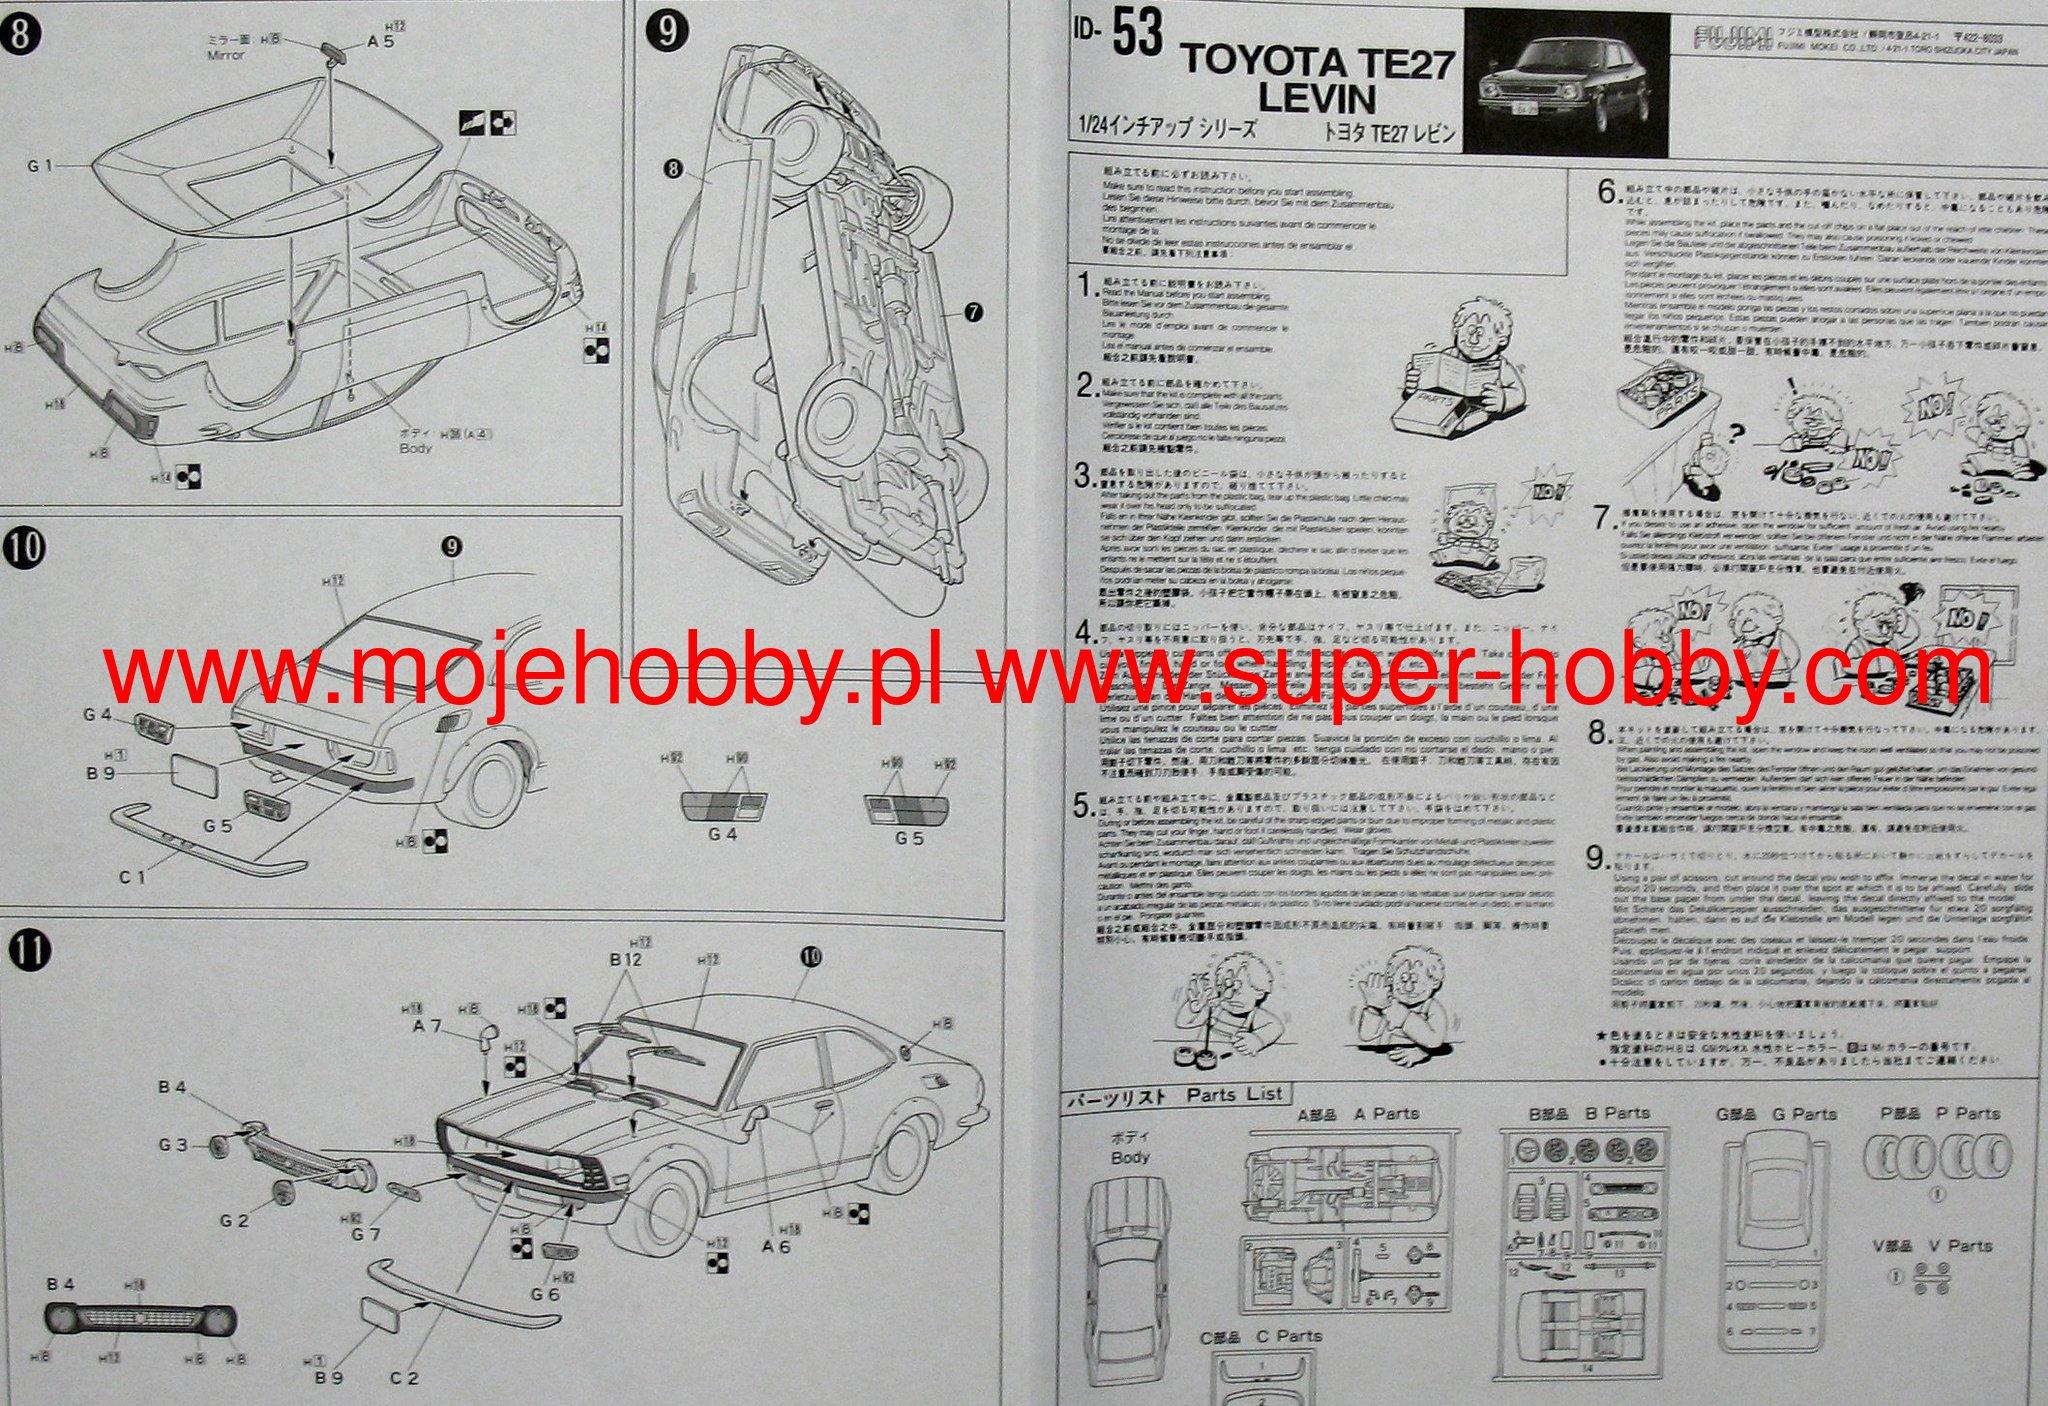 Toyota Levin Te27 Fujimi 120683 Wiring Diagram 2 Fjm120683 1